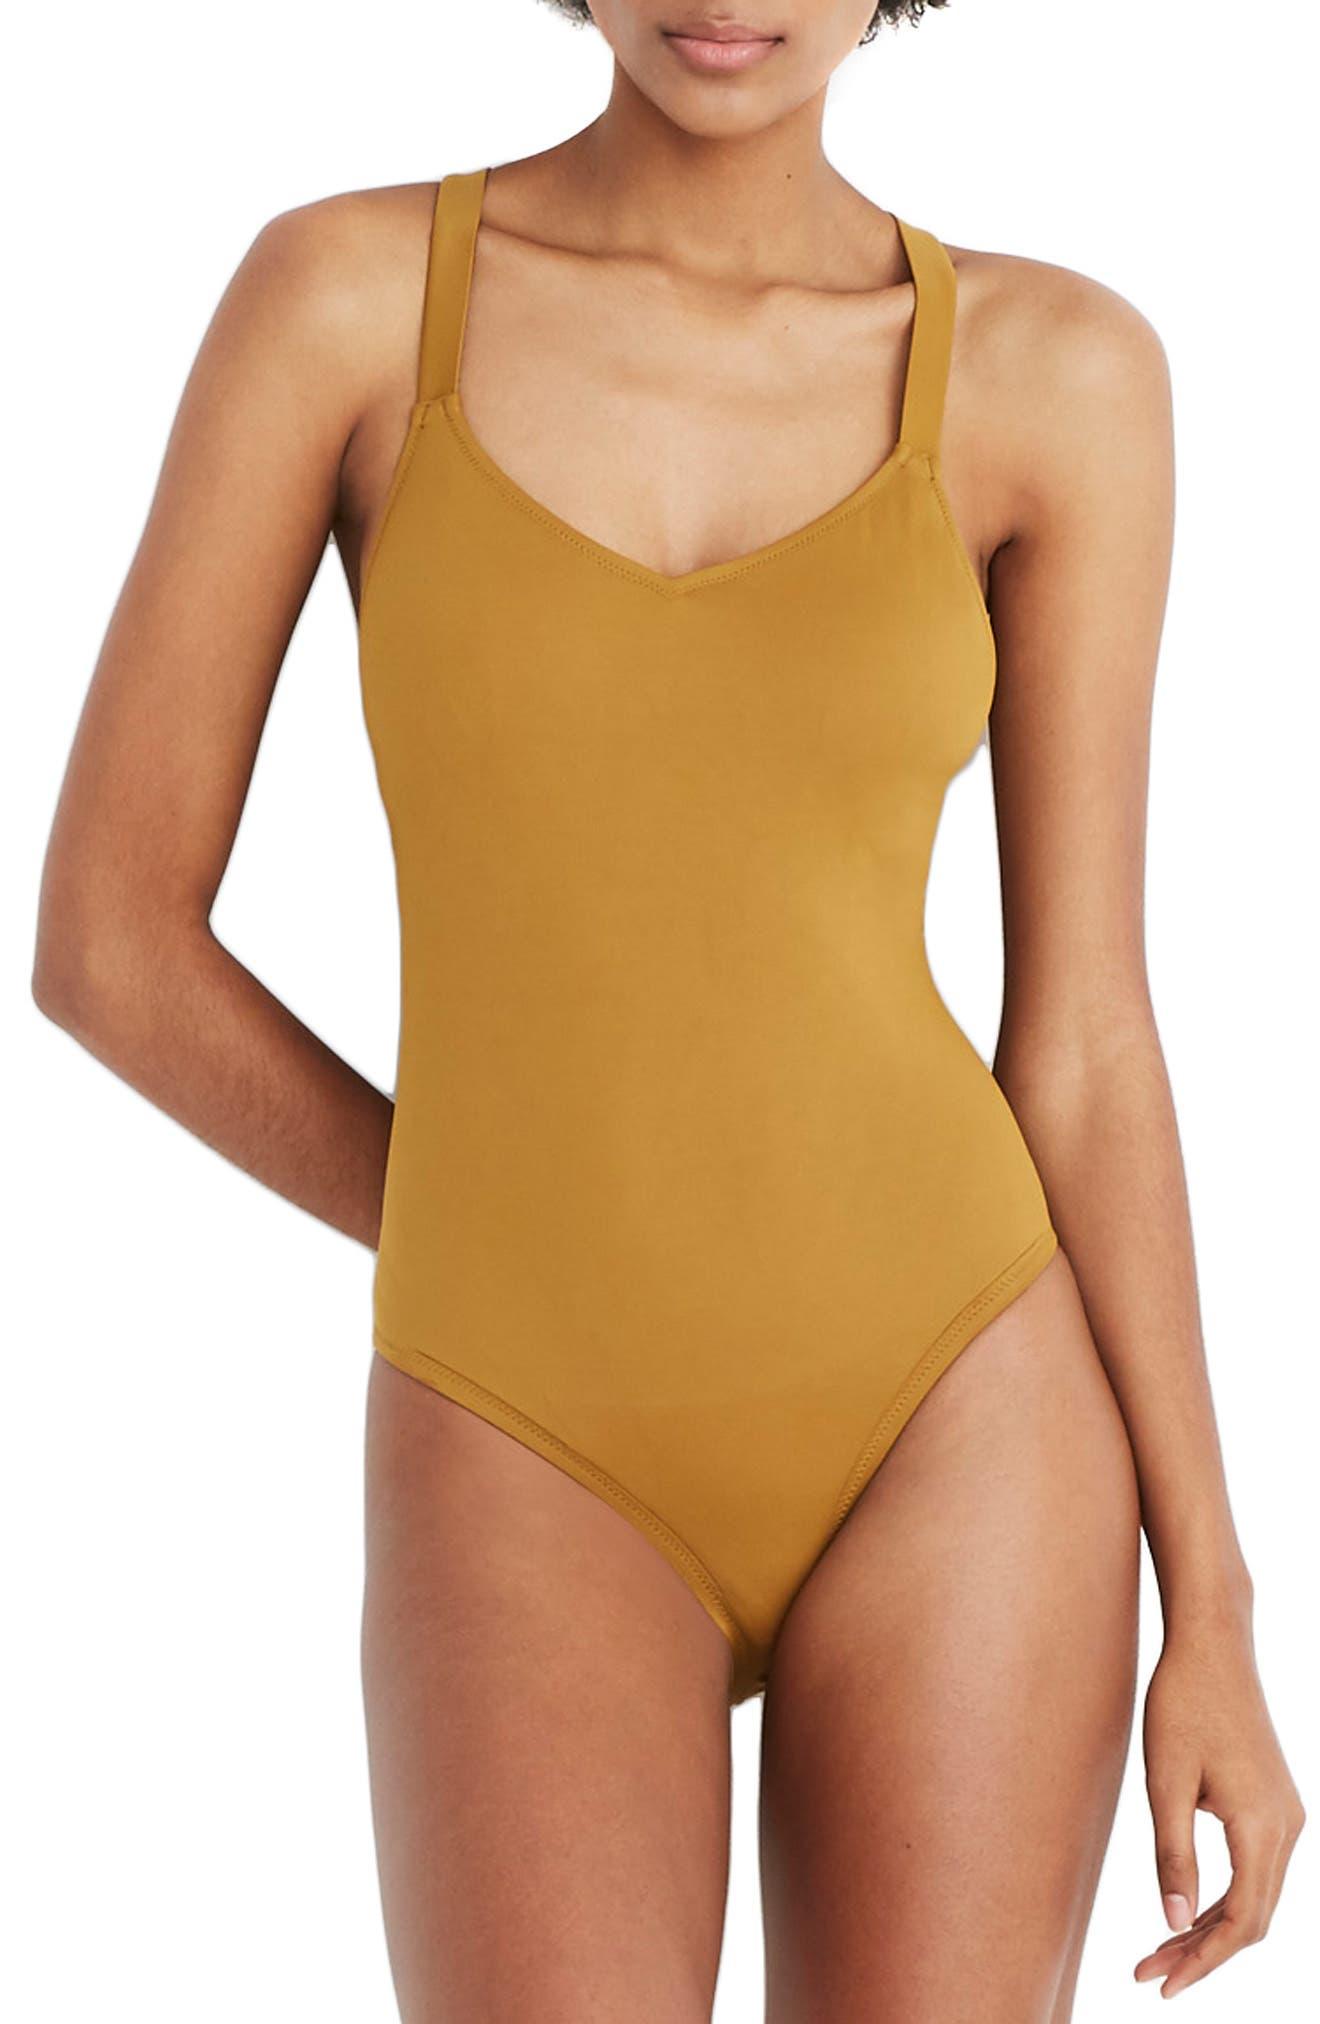 Madewell Second Wave Crisscross One-Piece Swimsuit, Green